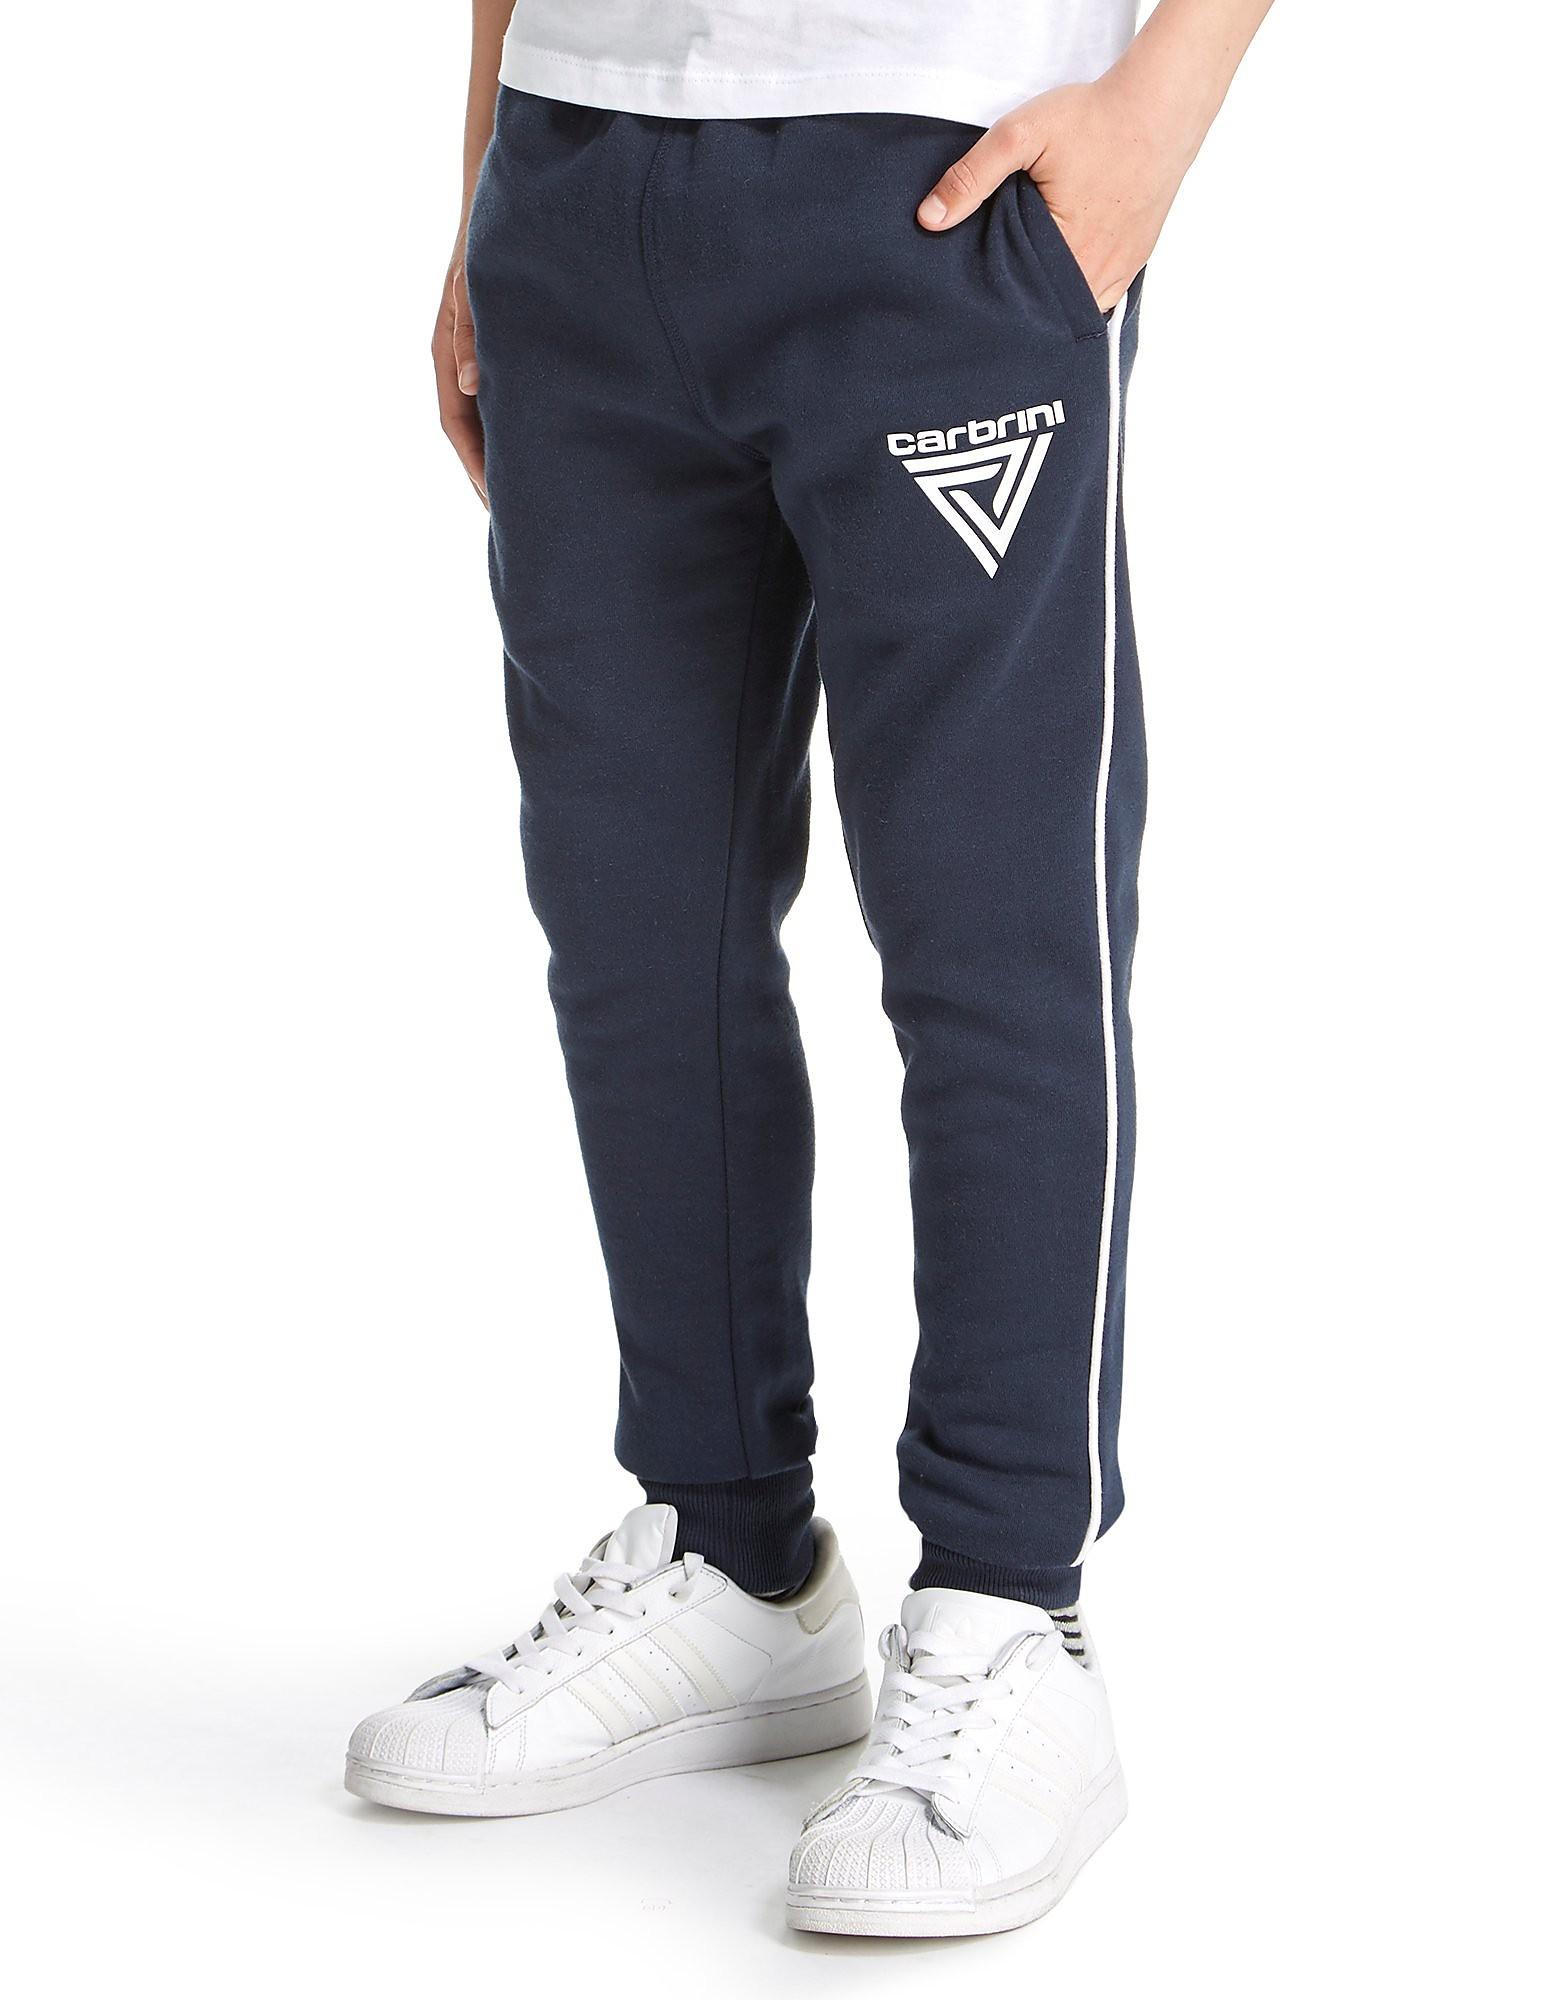 Carbrini Alphabet Fleece Pants Junior